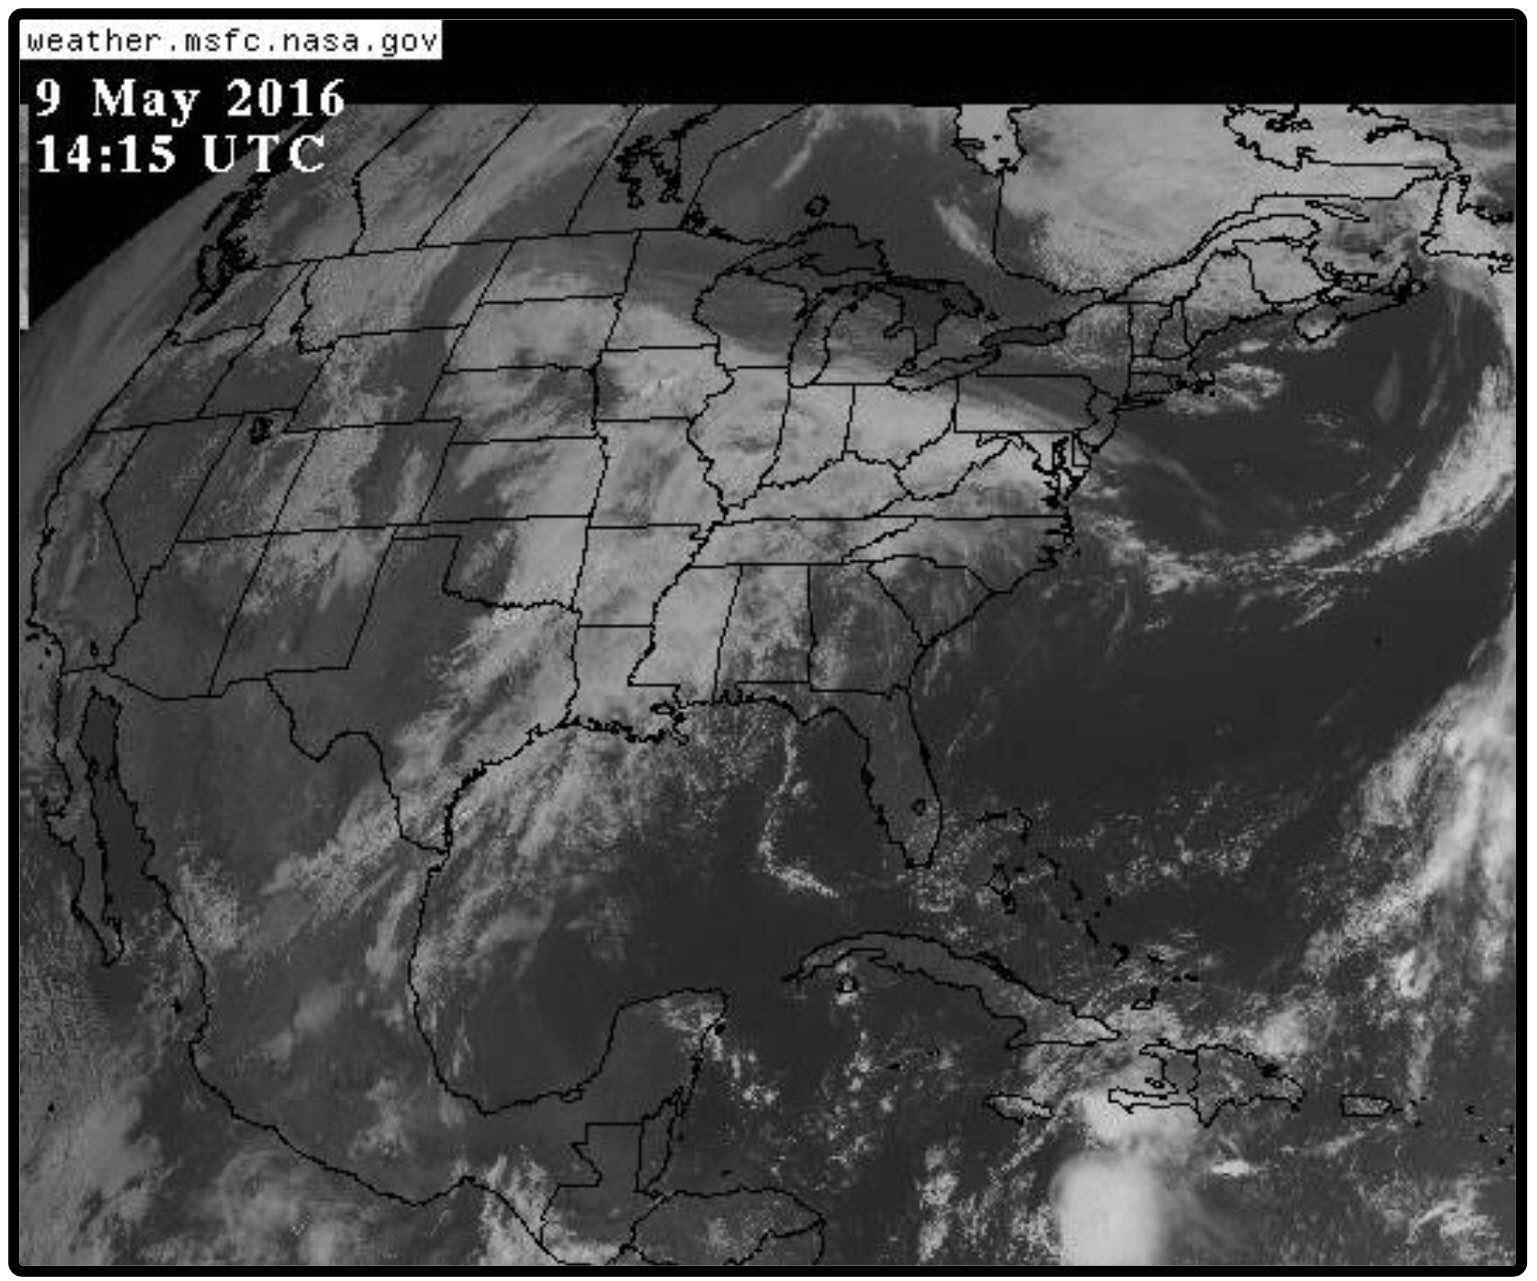 Photo: GOES weather image, May 9, 2016.